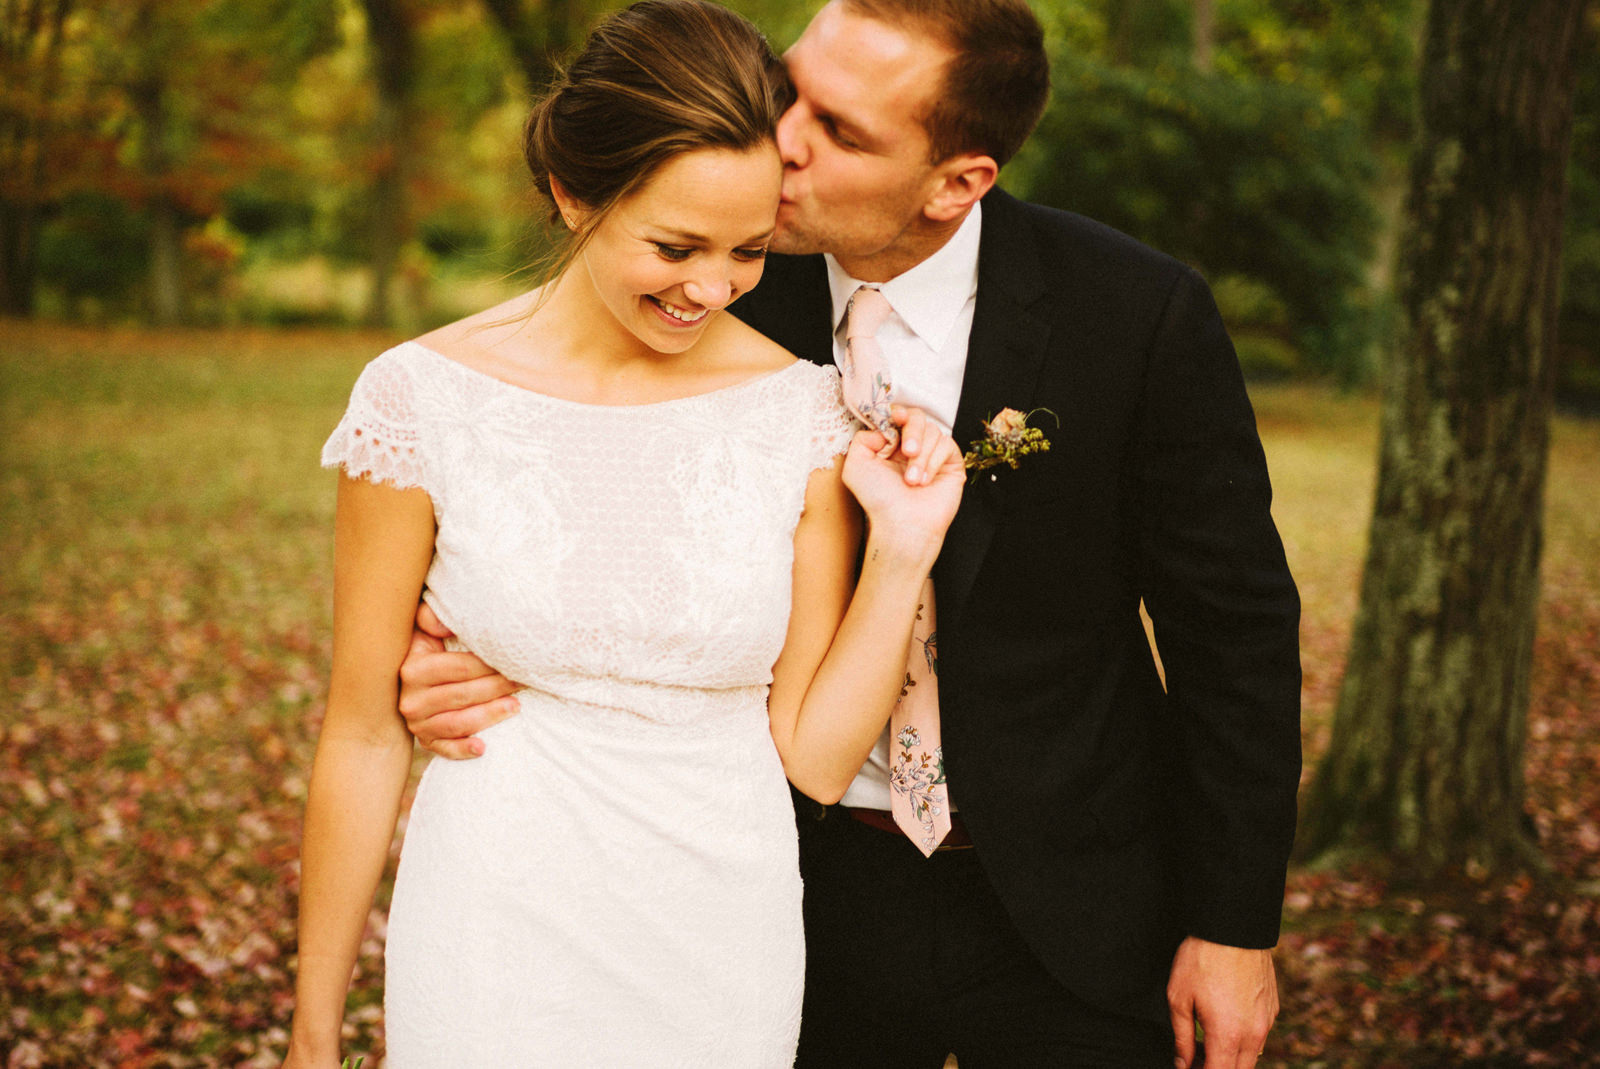 bridgeport-wedding-122 BRIDGEPORT, CONNECTICUT BACKYARD WEDDING